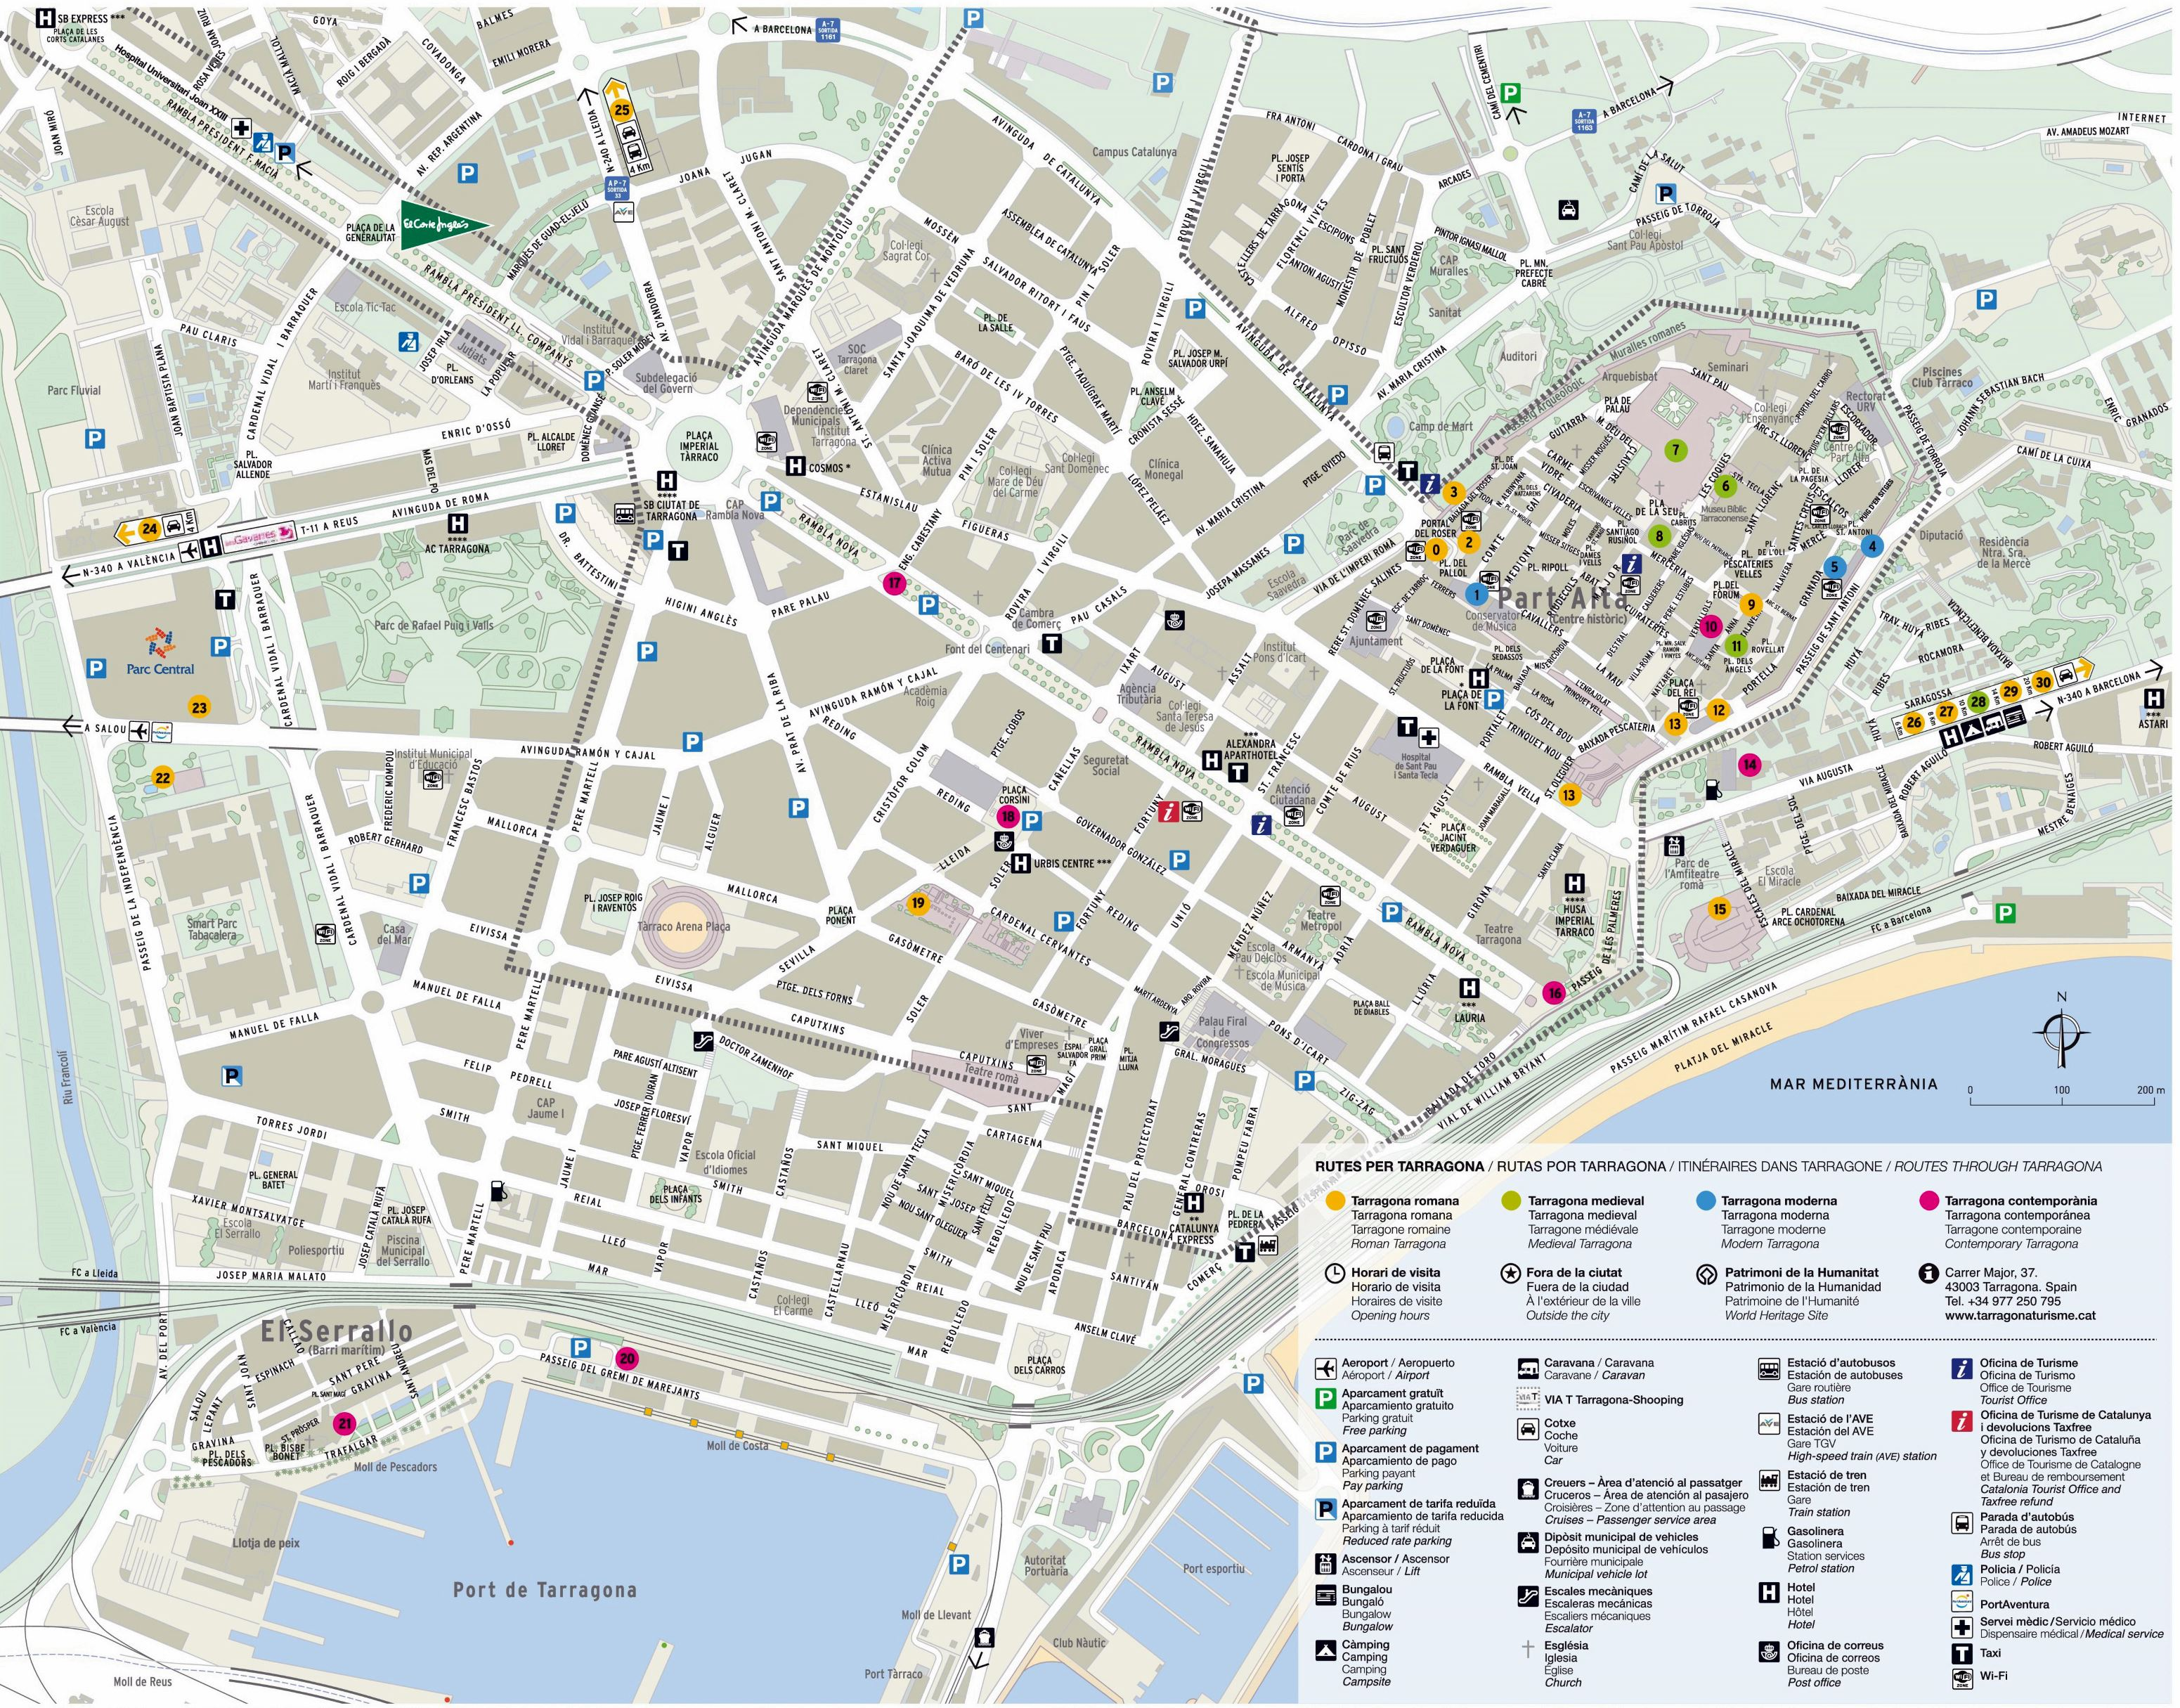 tarragona mapa Large Tarragona Maps for Free Download and Print | High Resolution  tarragona mapa